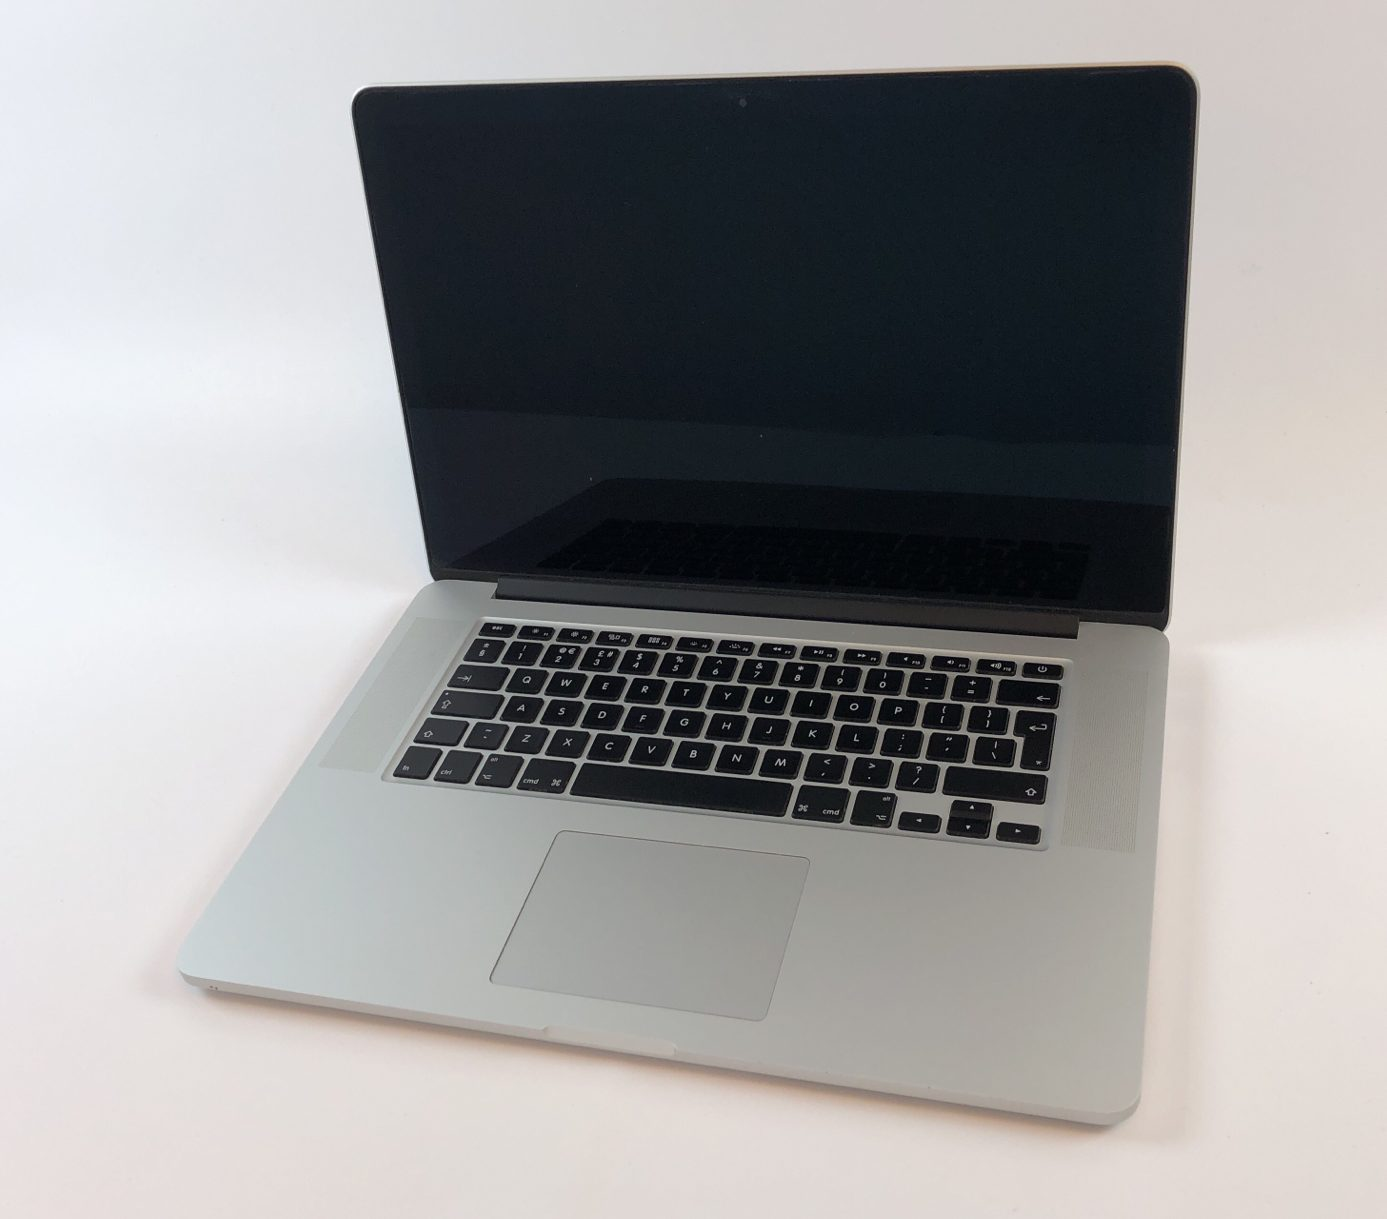 "MacBook Pro Retina 15"" Late 2013 (Intel Quad-Core i7 2.0 GHz 8 GB RAM 256 GB SSD), Intel Quad-Core i7 2.0 GHz, 8 GB RAM, 256 GB SSD, image 1"